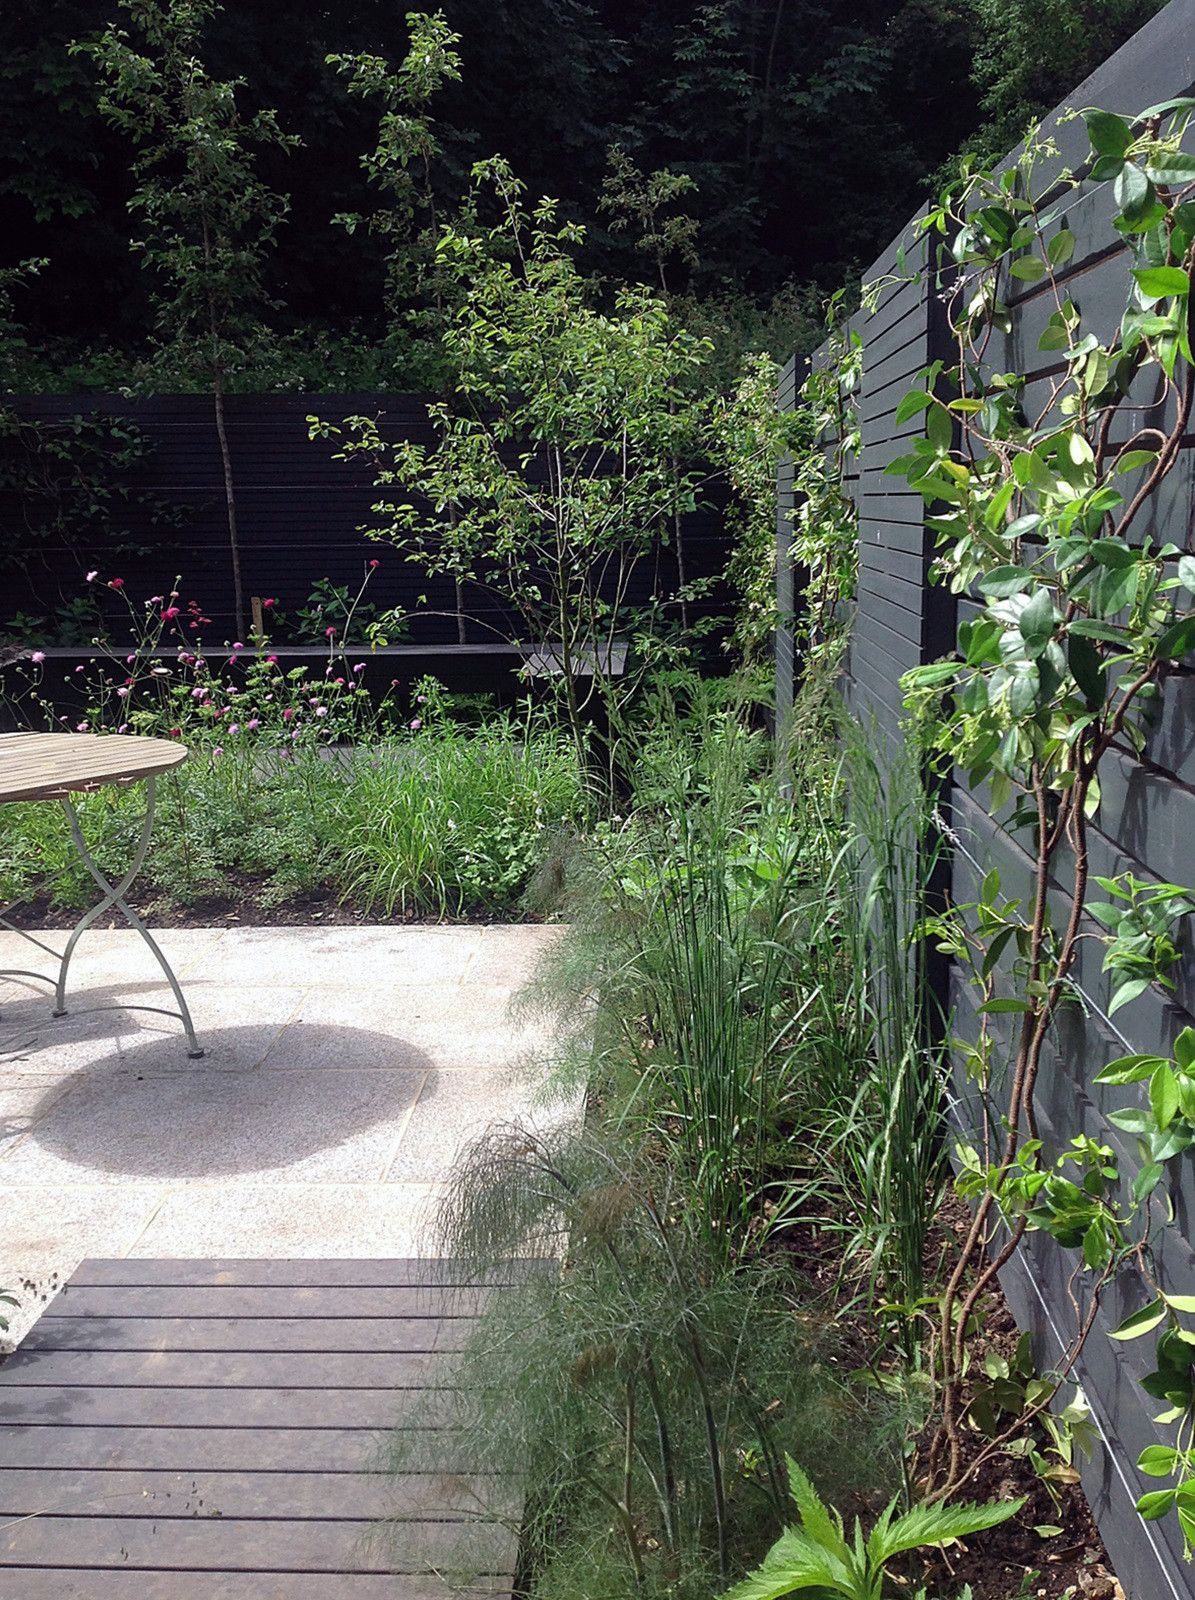 London small garden design peckham dulwich clapham battersea designer london